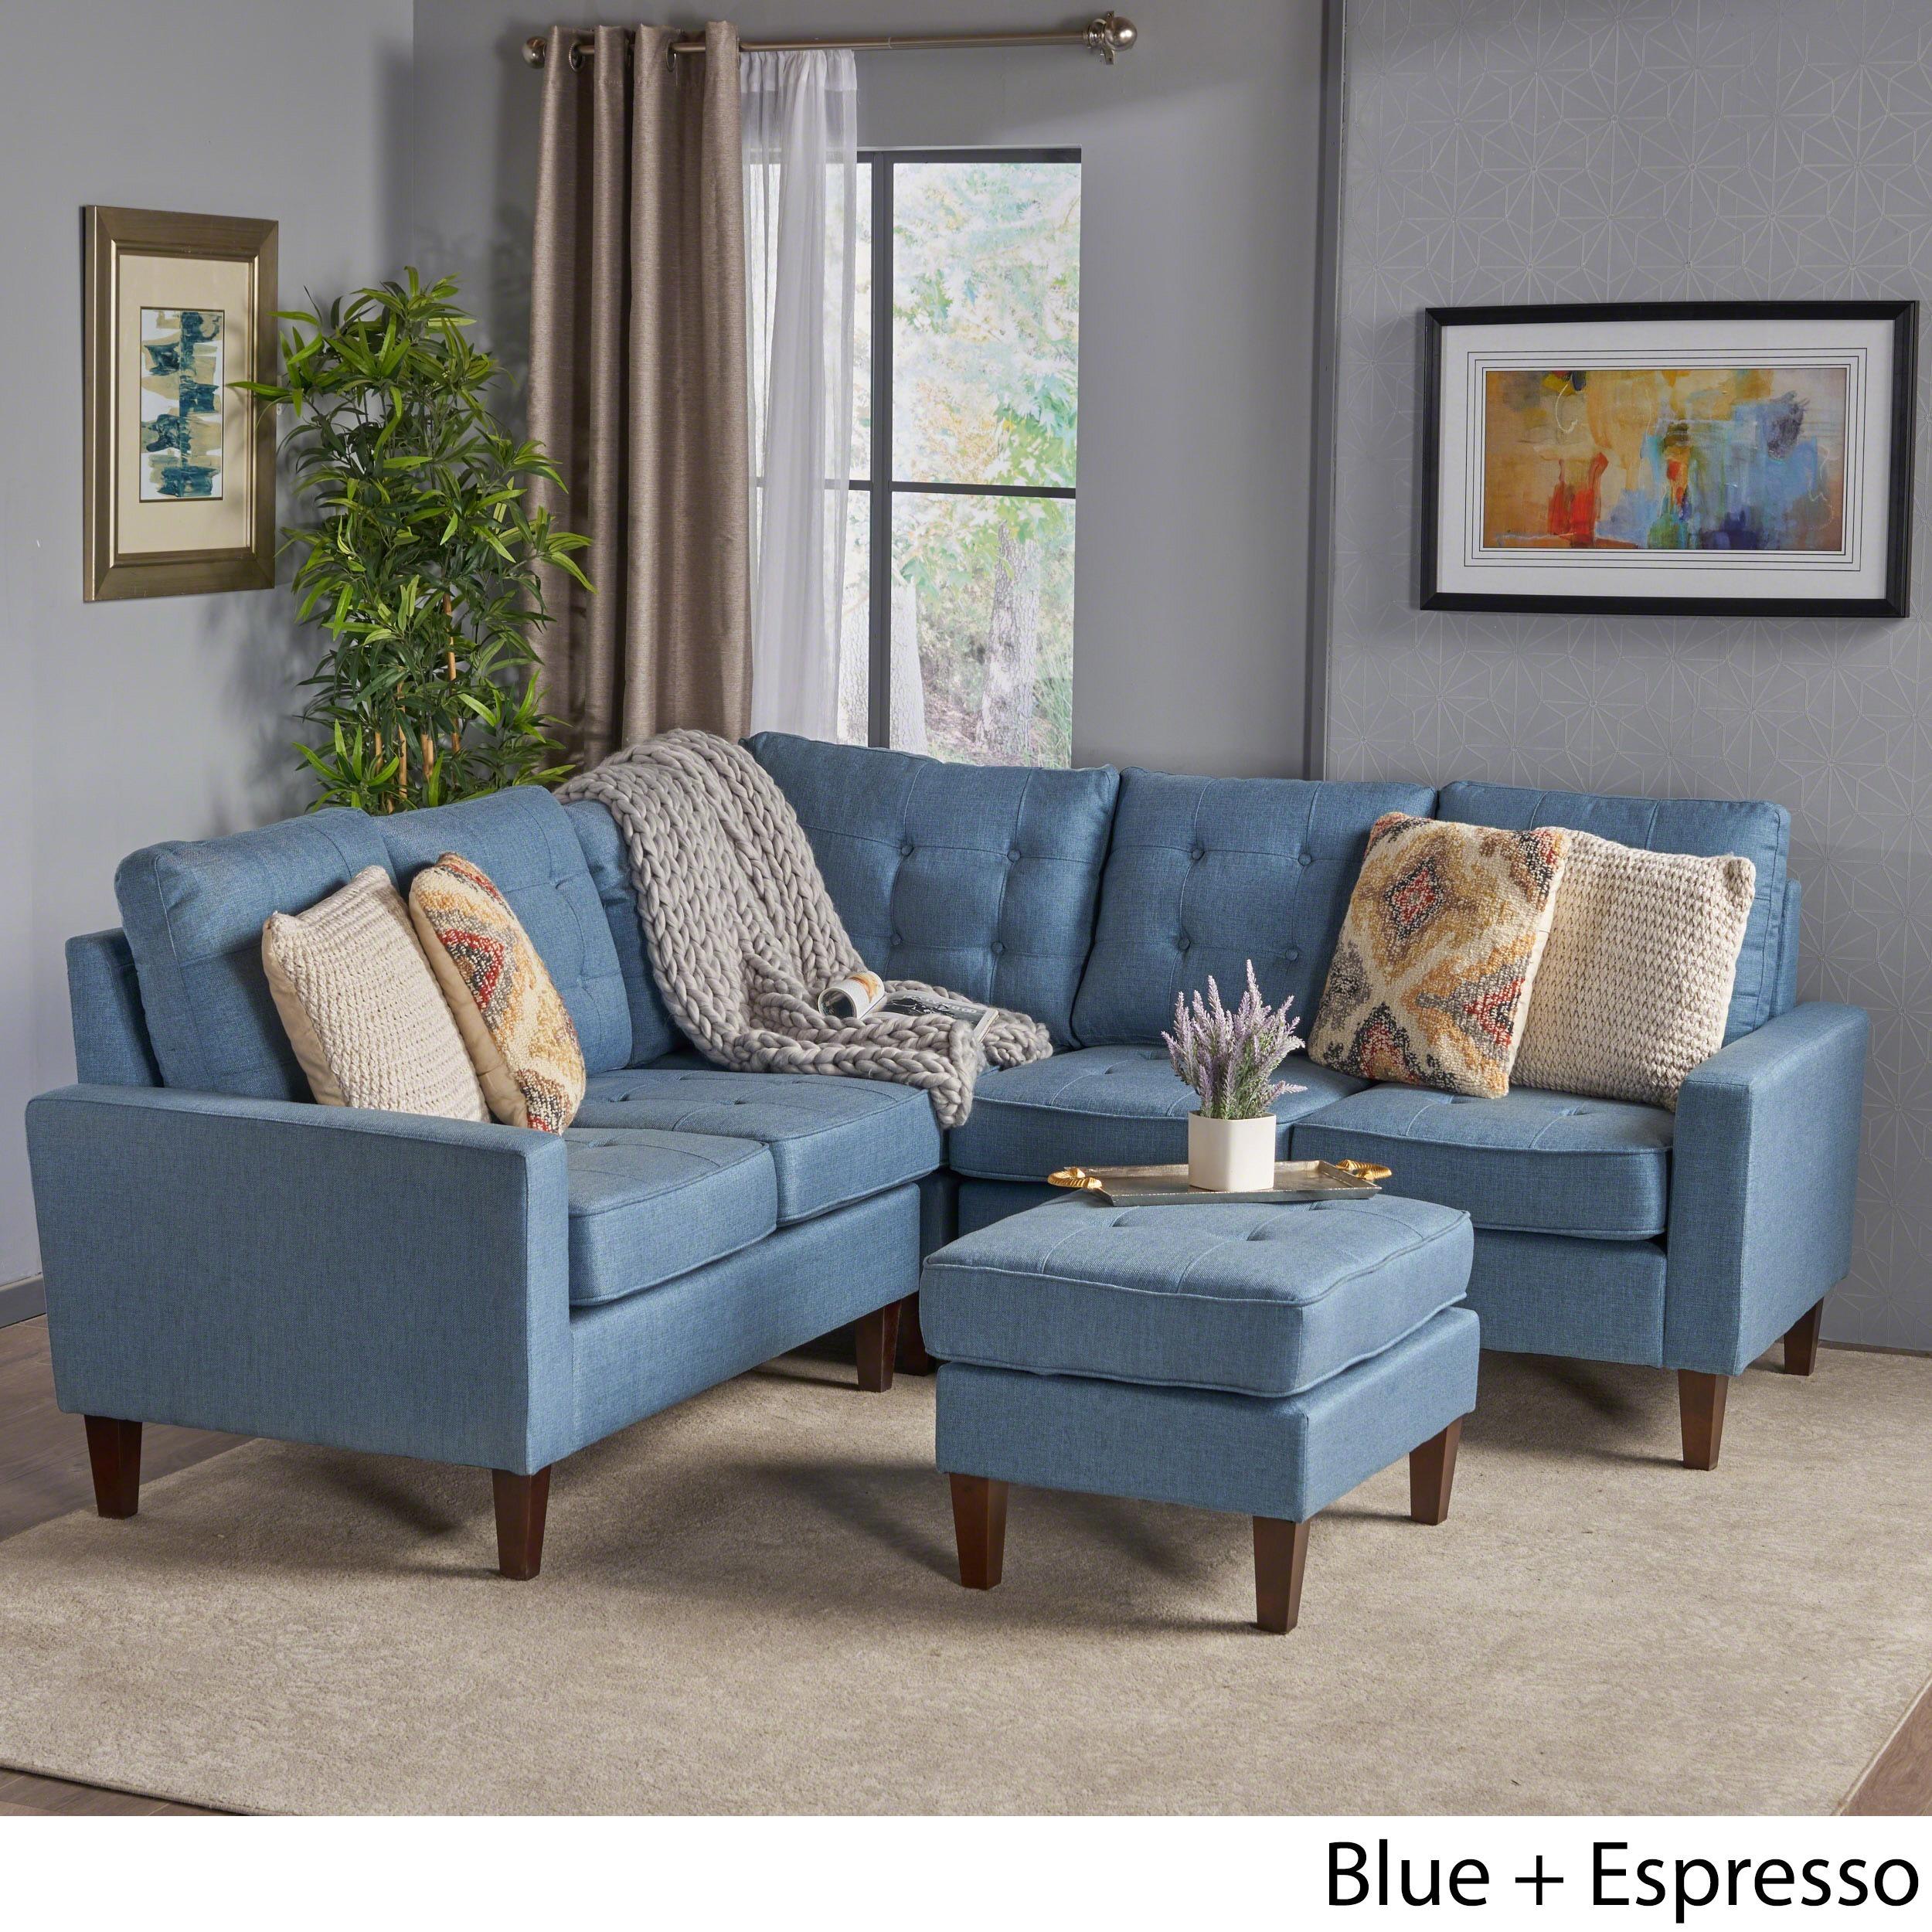 Remarkable Nasir Mid Century Modern 4 Piece Sectional Sofa Set By Christopher Knight Home Spiritservingveterans Wood Chair Design Ideas Spiritservingveteransorg